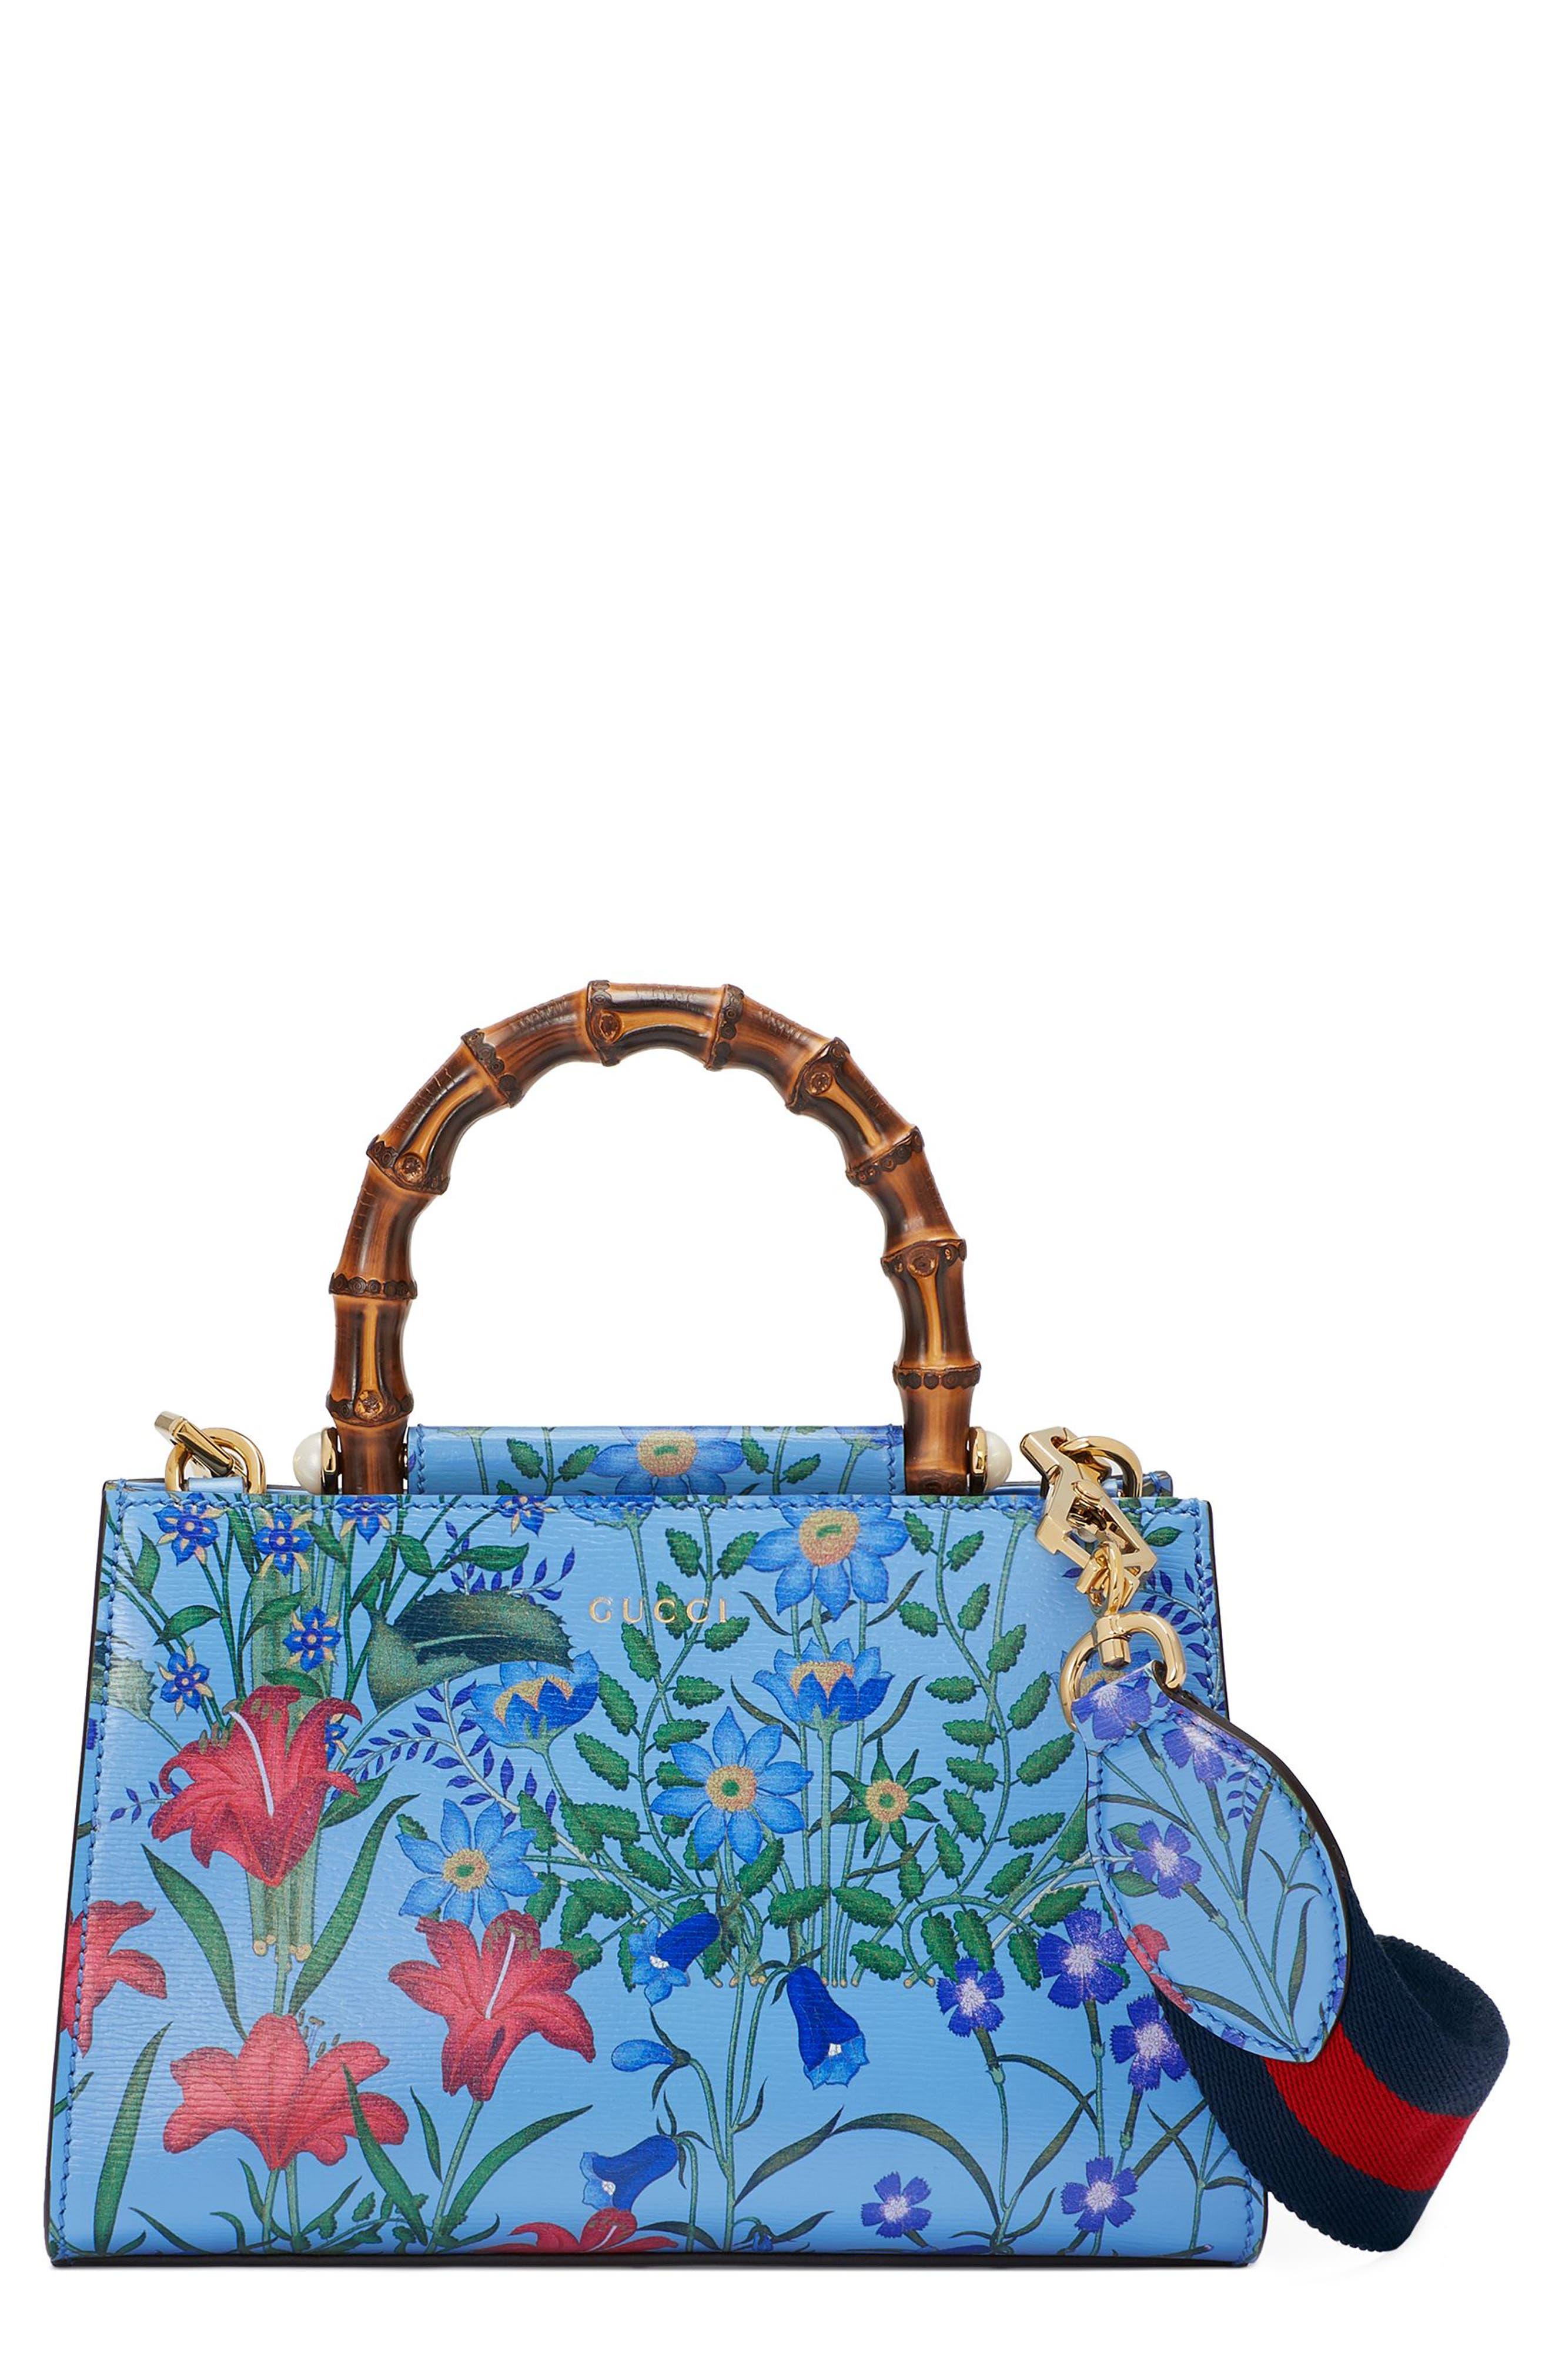 Main Image - Gucci Mini Nymphea Leather Top Handle Satchel